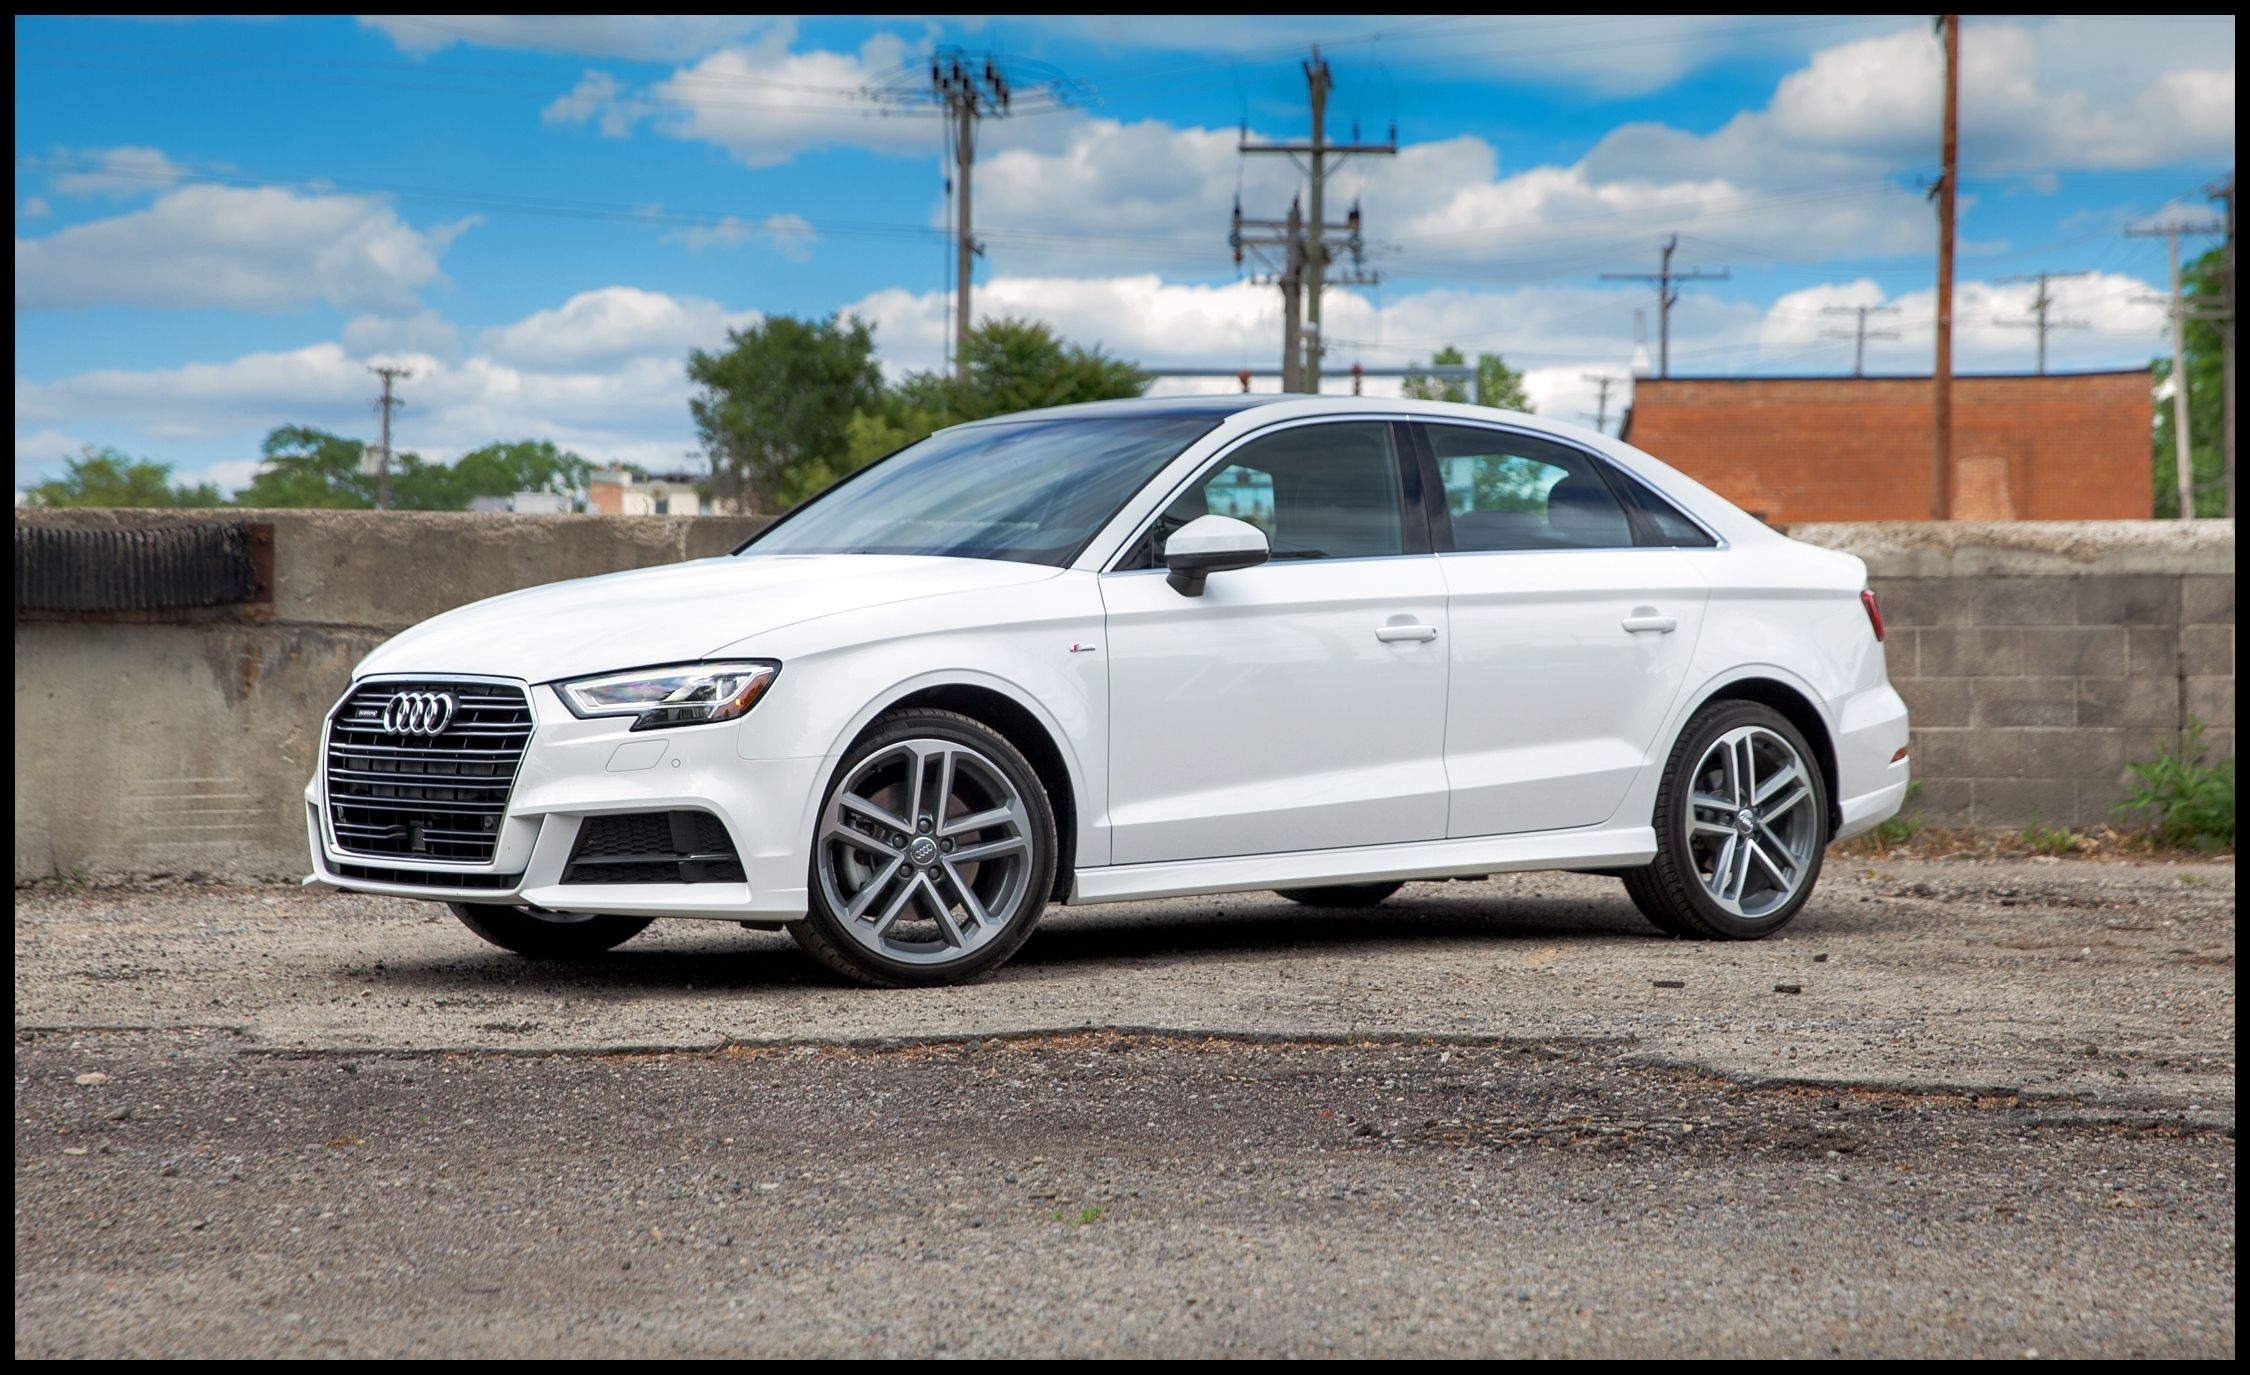 2017 audi a3 in depth model review car and driver photo s original